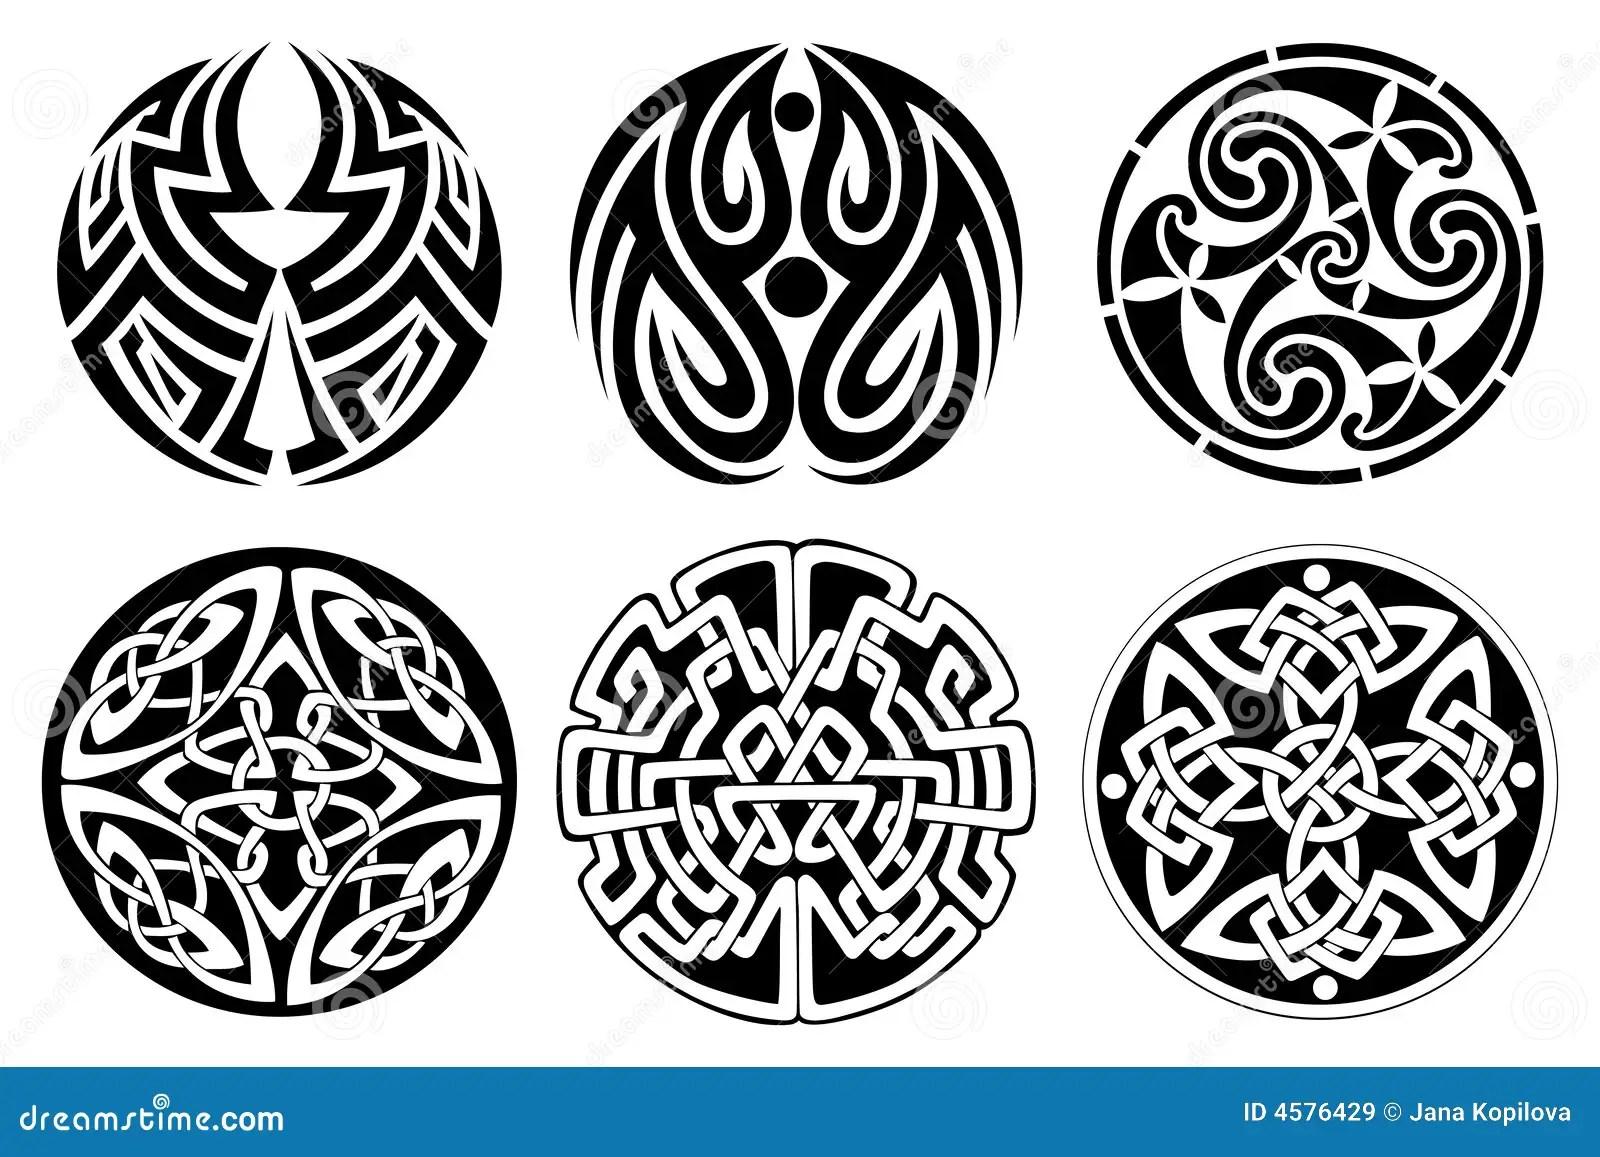 Celtic Ornament Stock Vector. Illustration Of Calligraphic